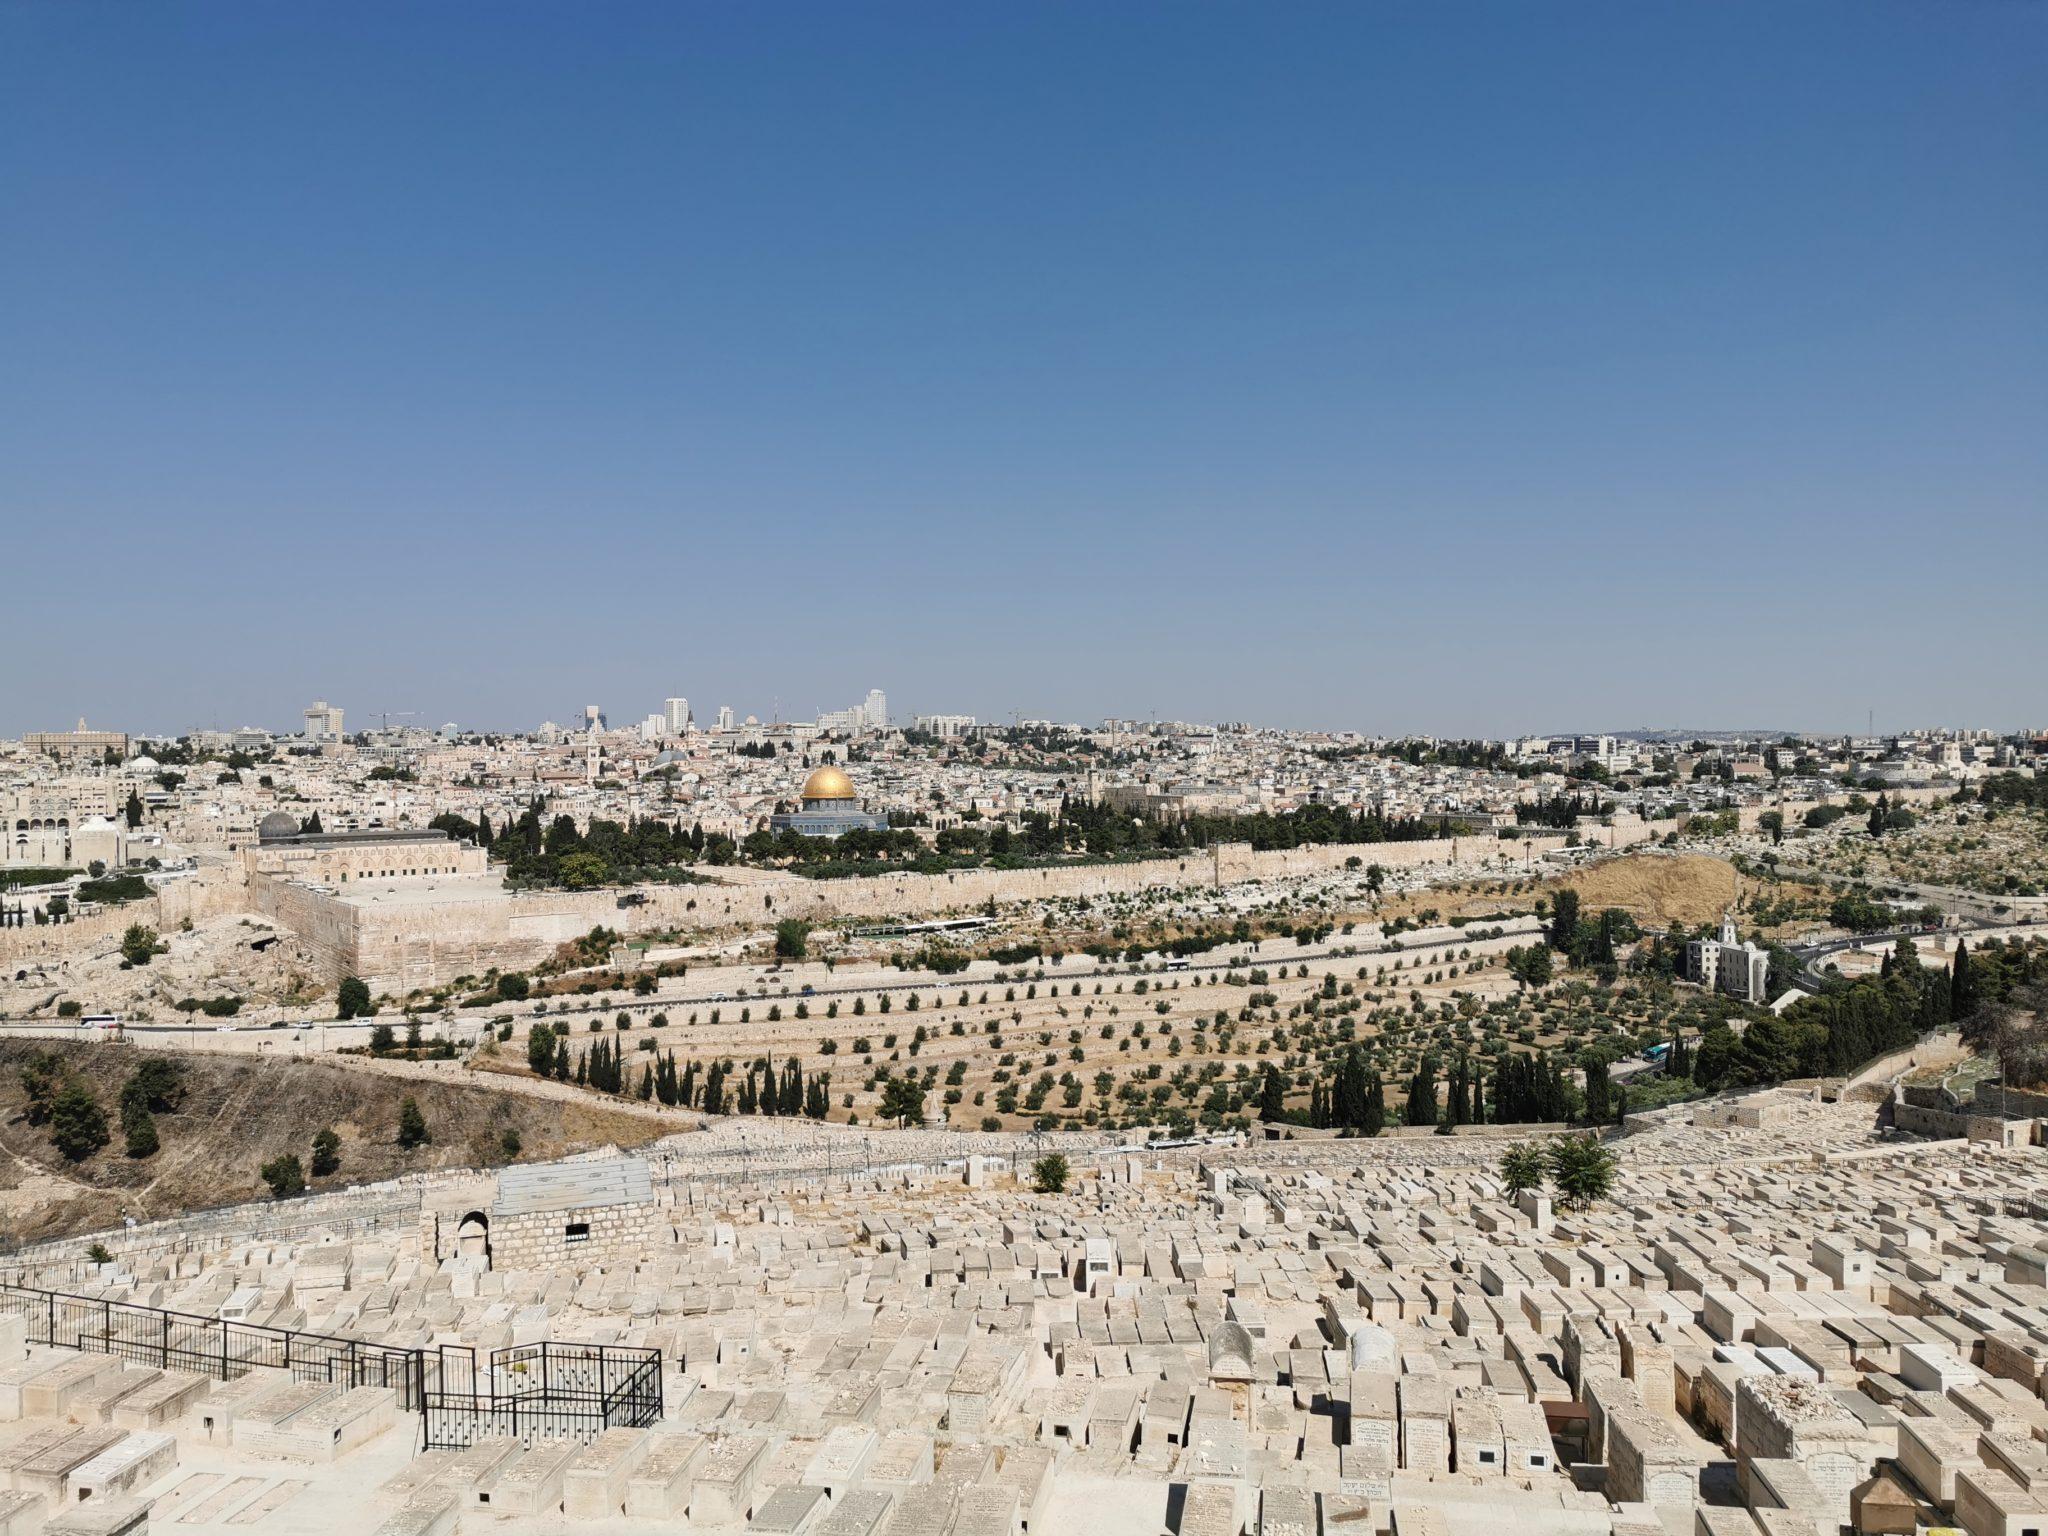 Israelul în imagini